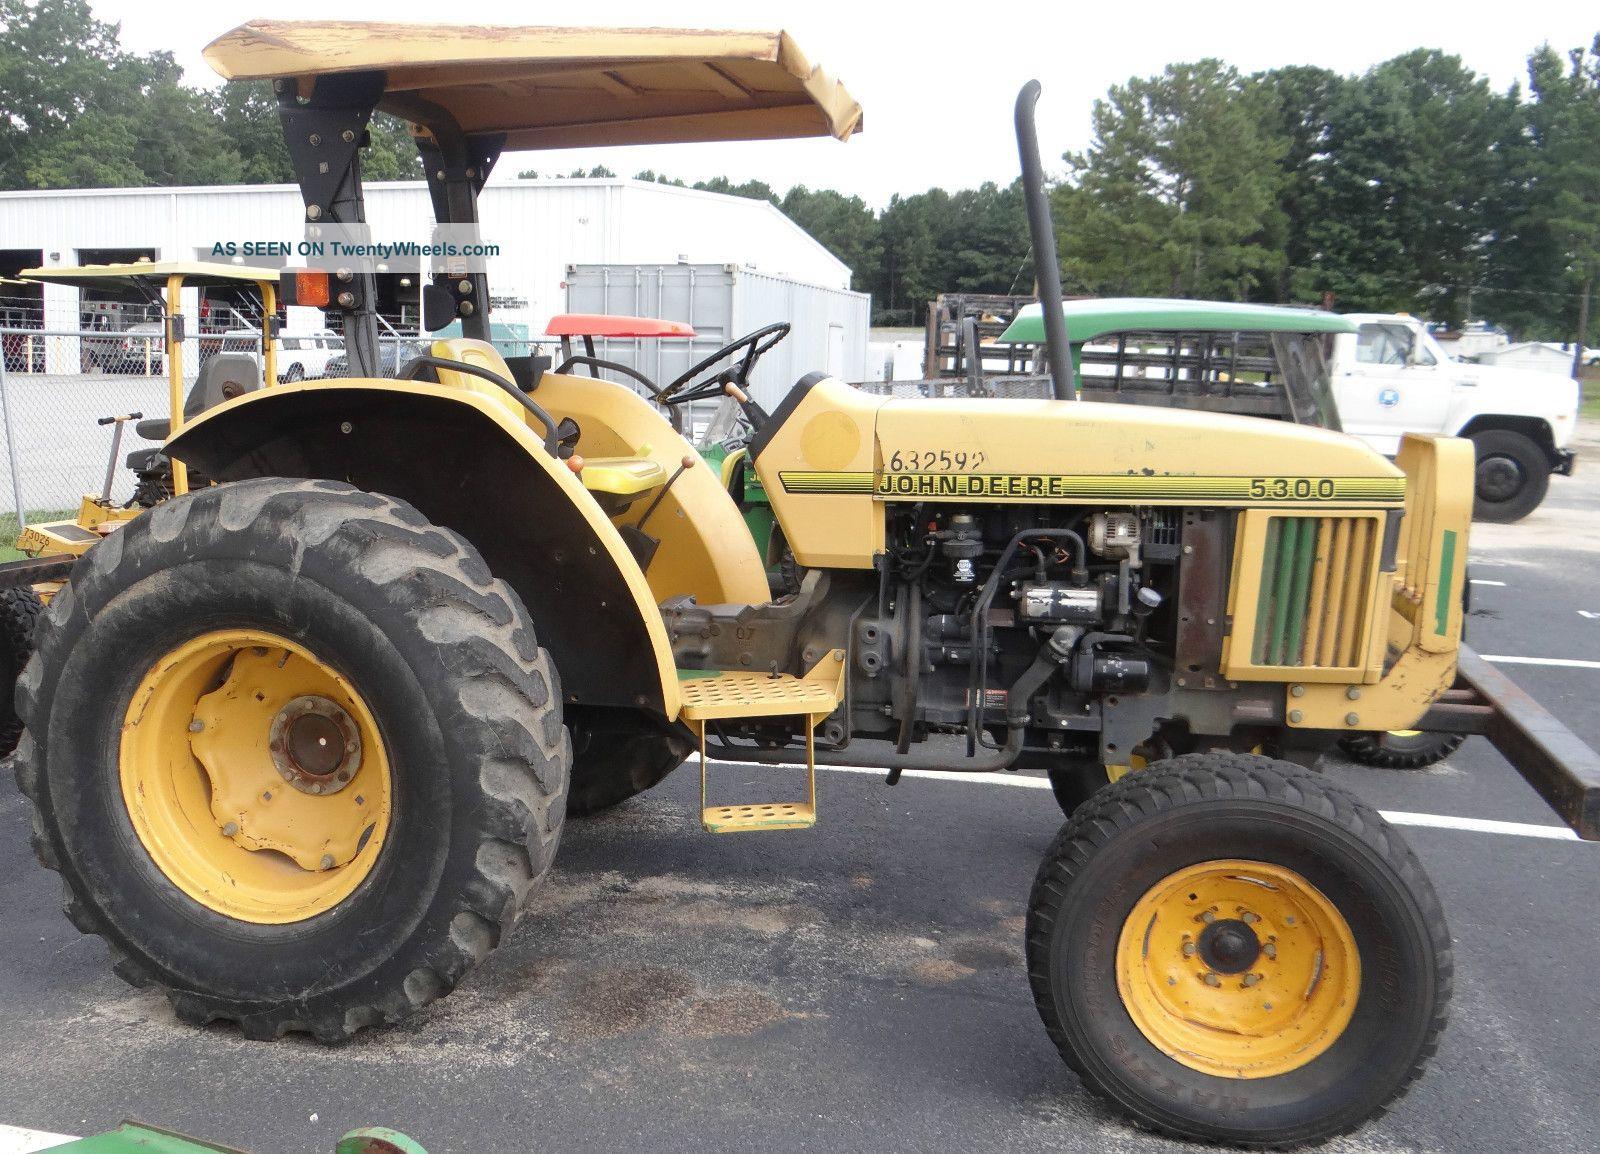 John Deere Bush Hog : John deere tractor with bush hog